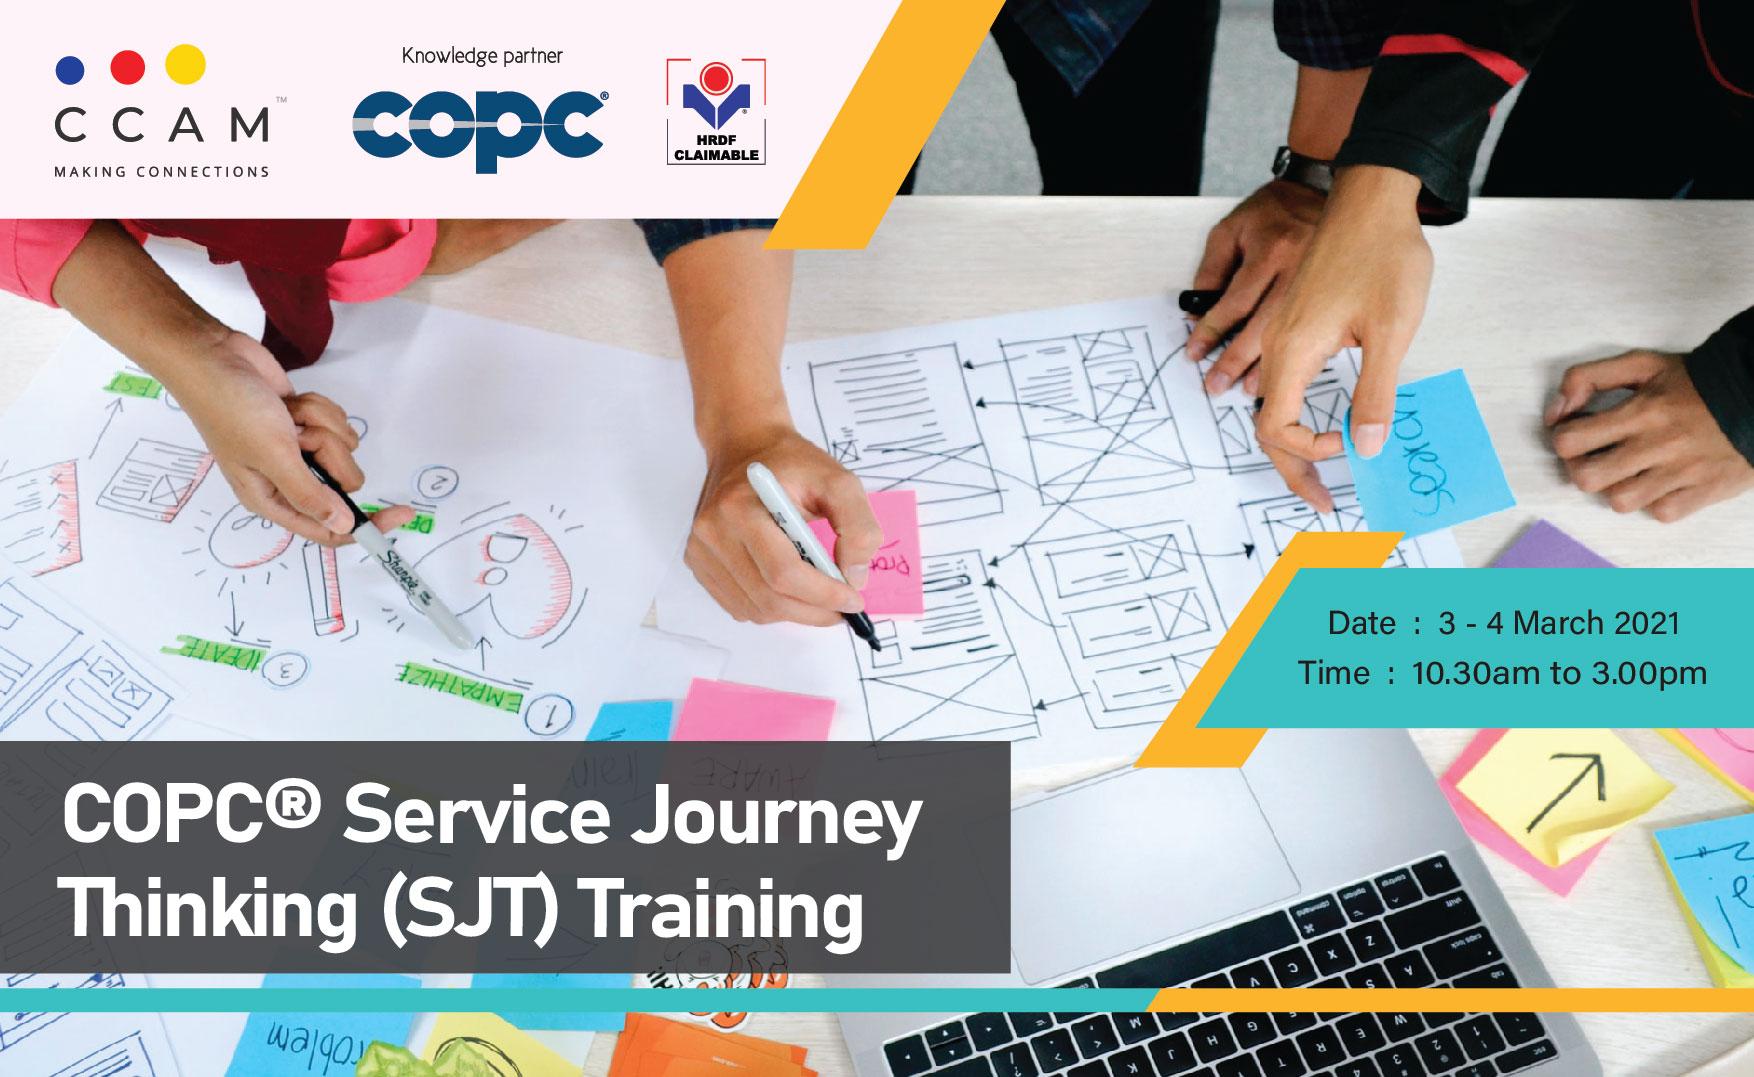 COPC® Service Journey Thinking